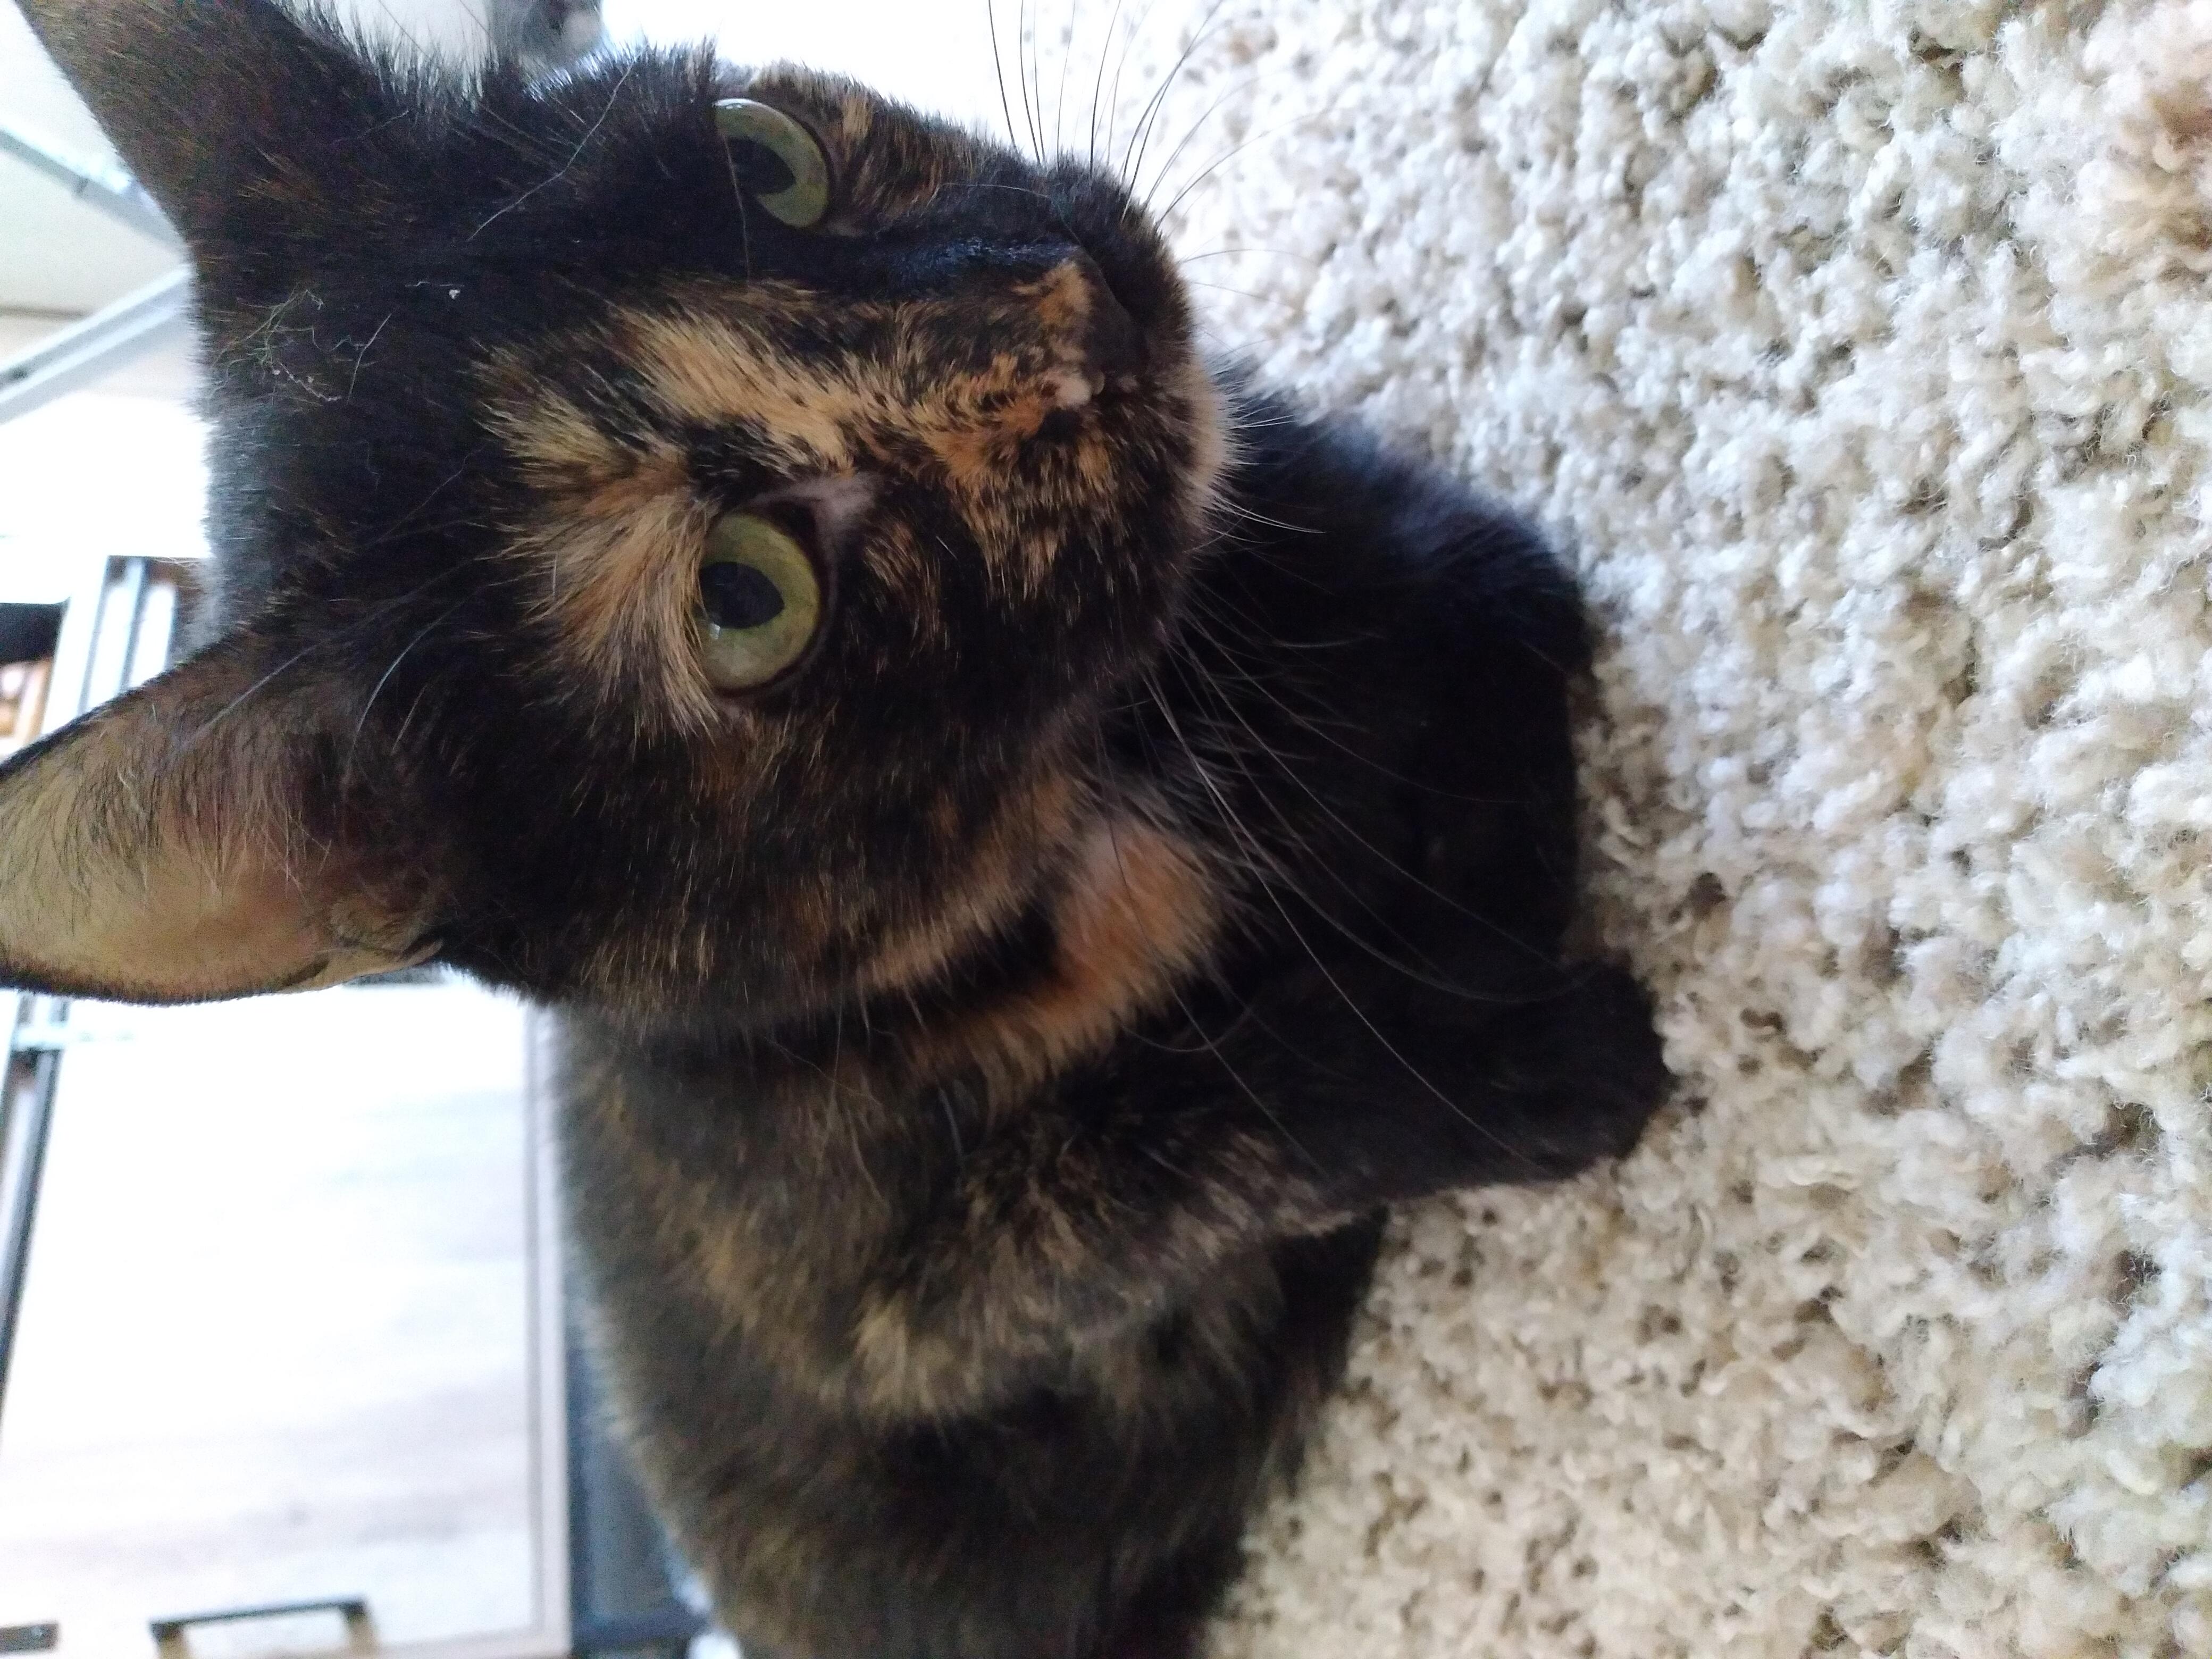 adoptable Cat in Reno,NV named Treyu